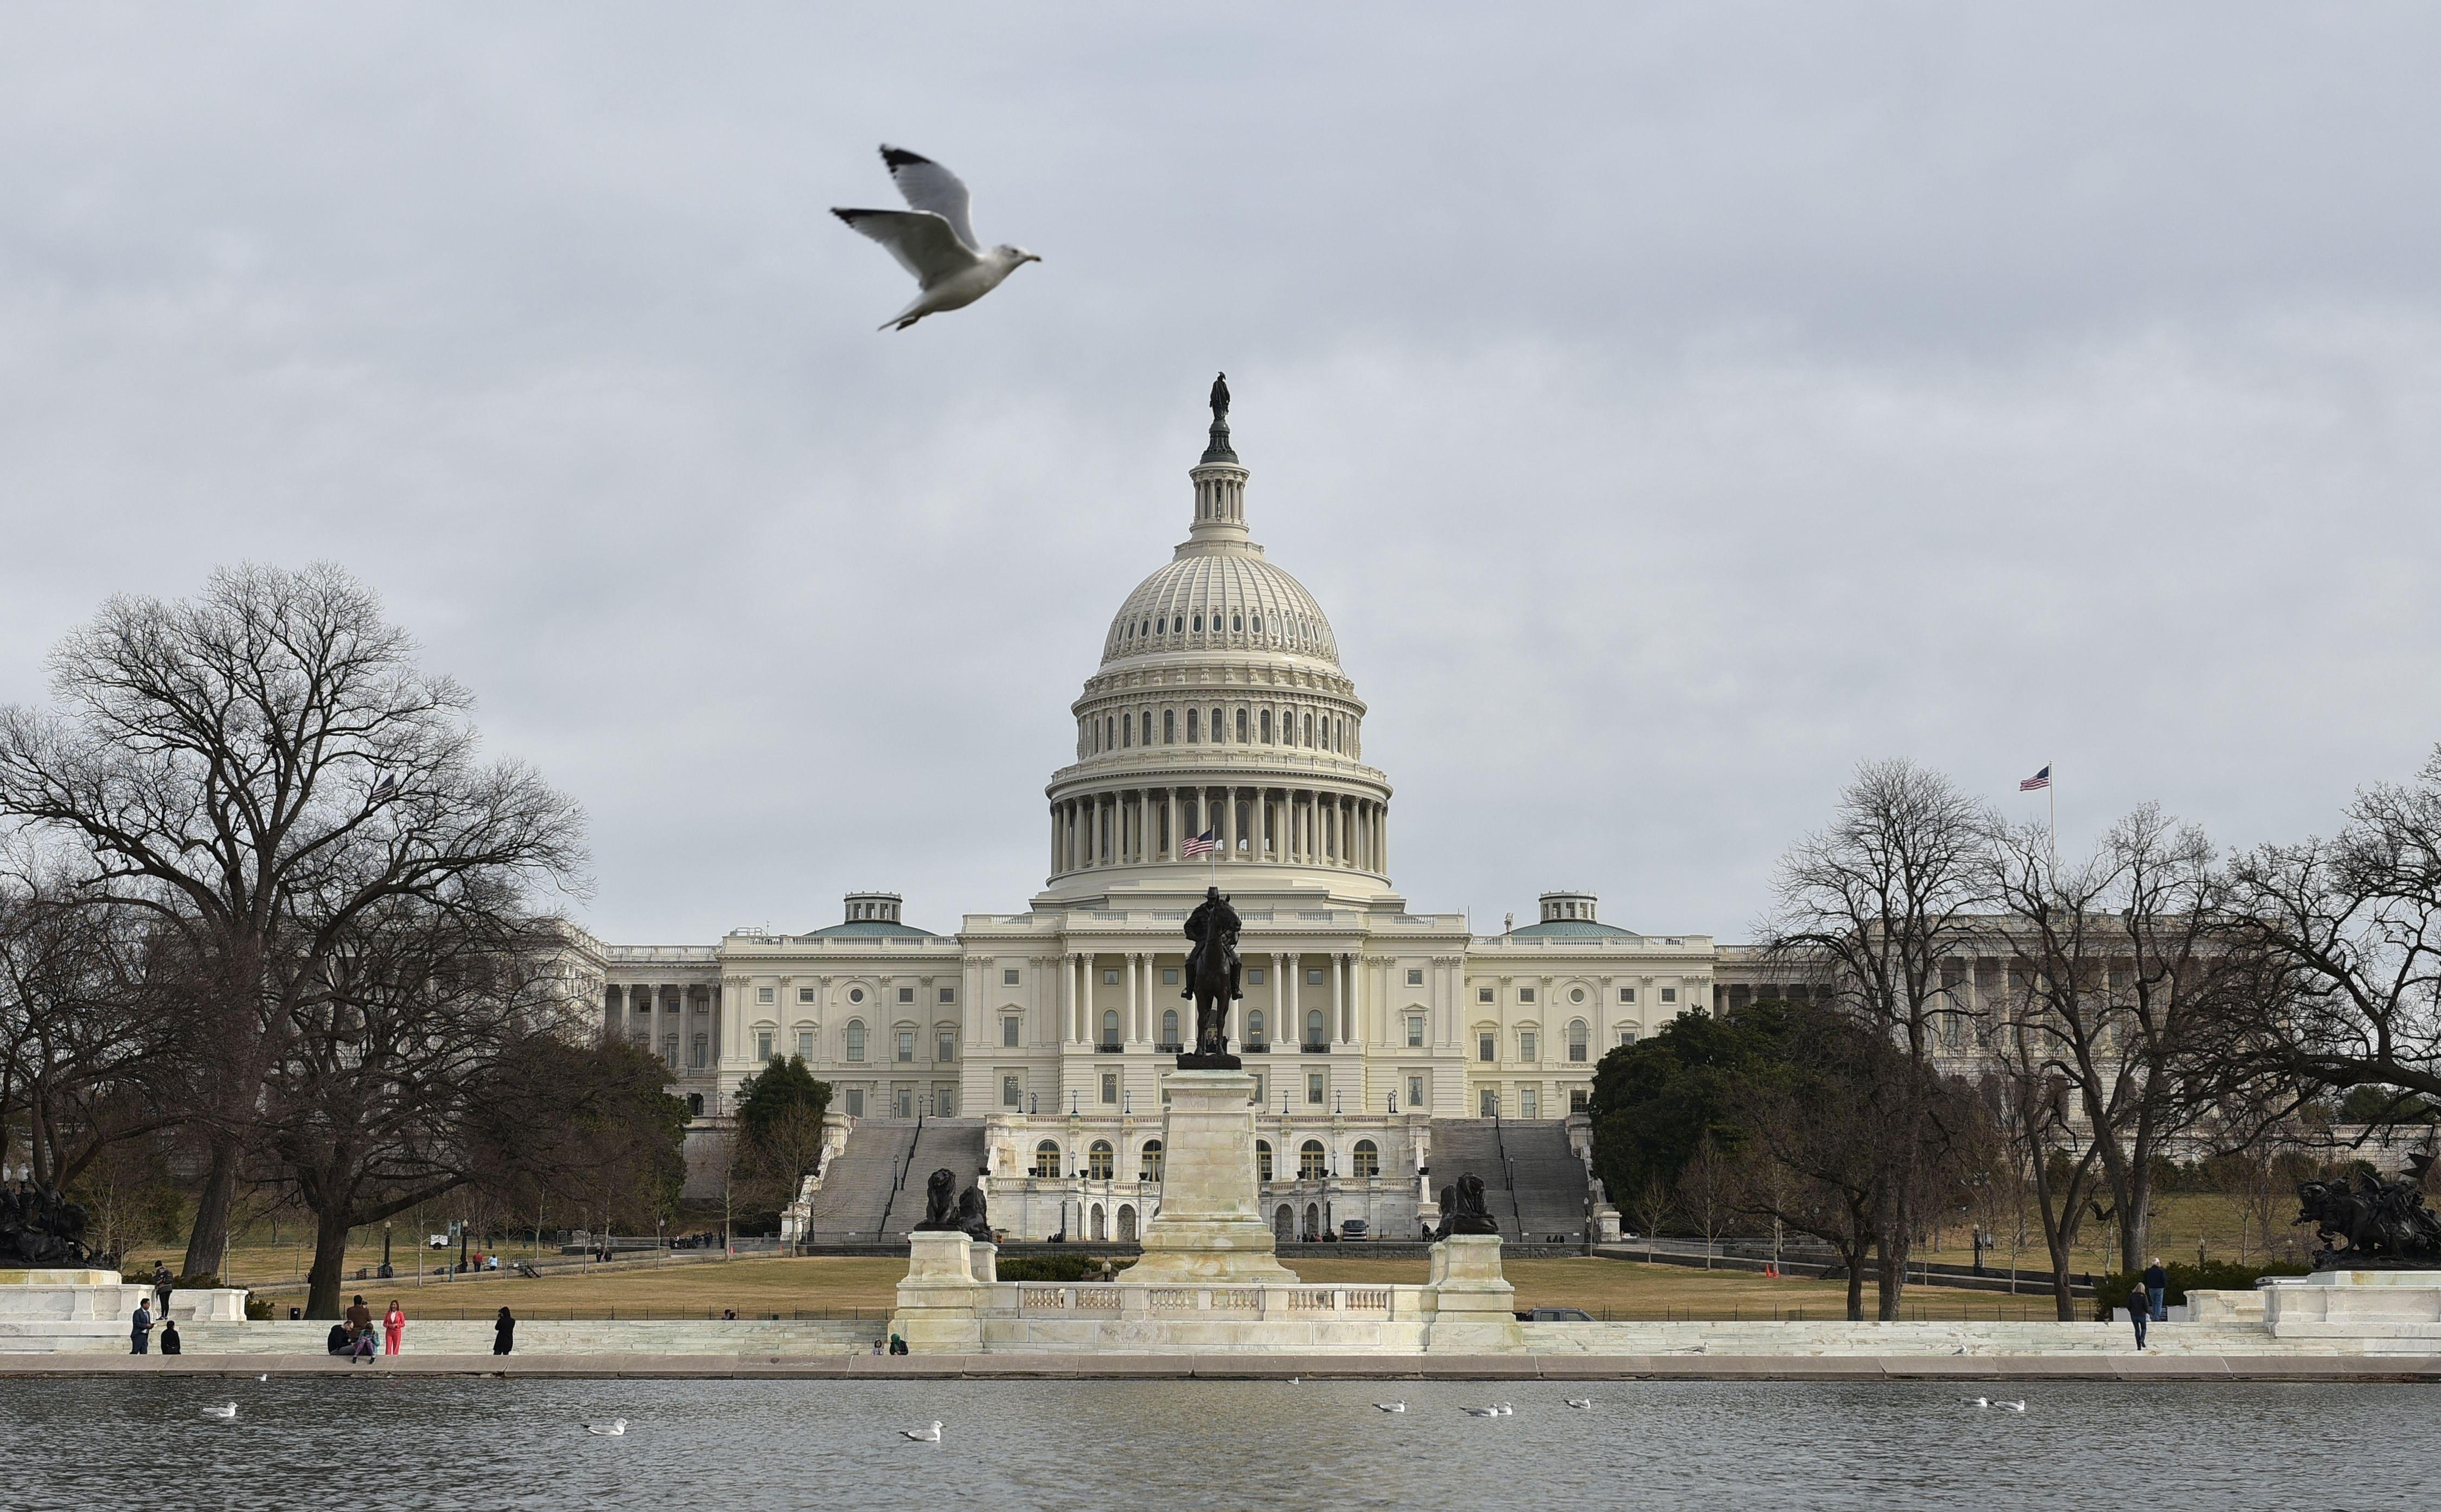 Congress weighs response to attacks on Saudi oil facilities